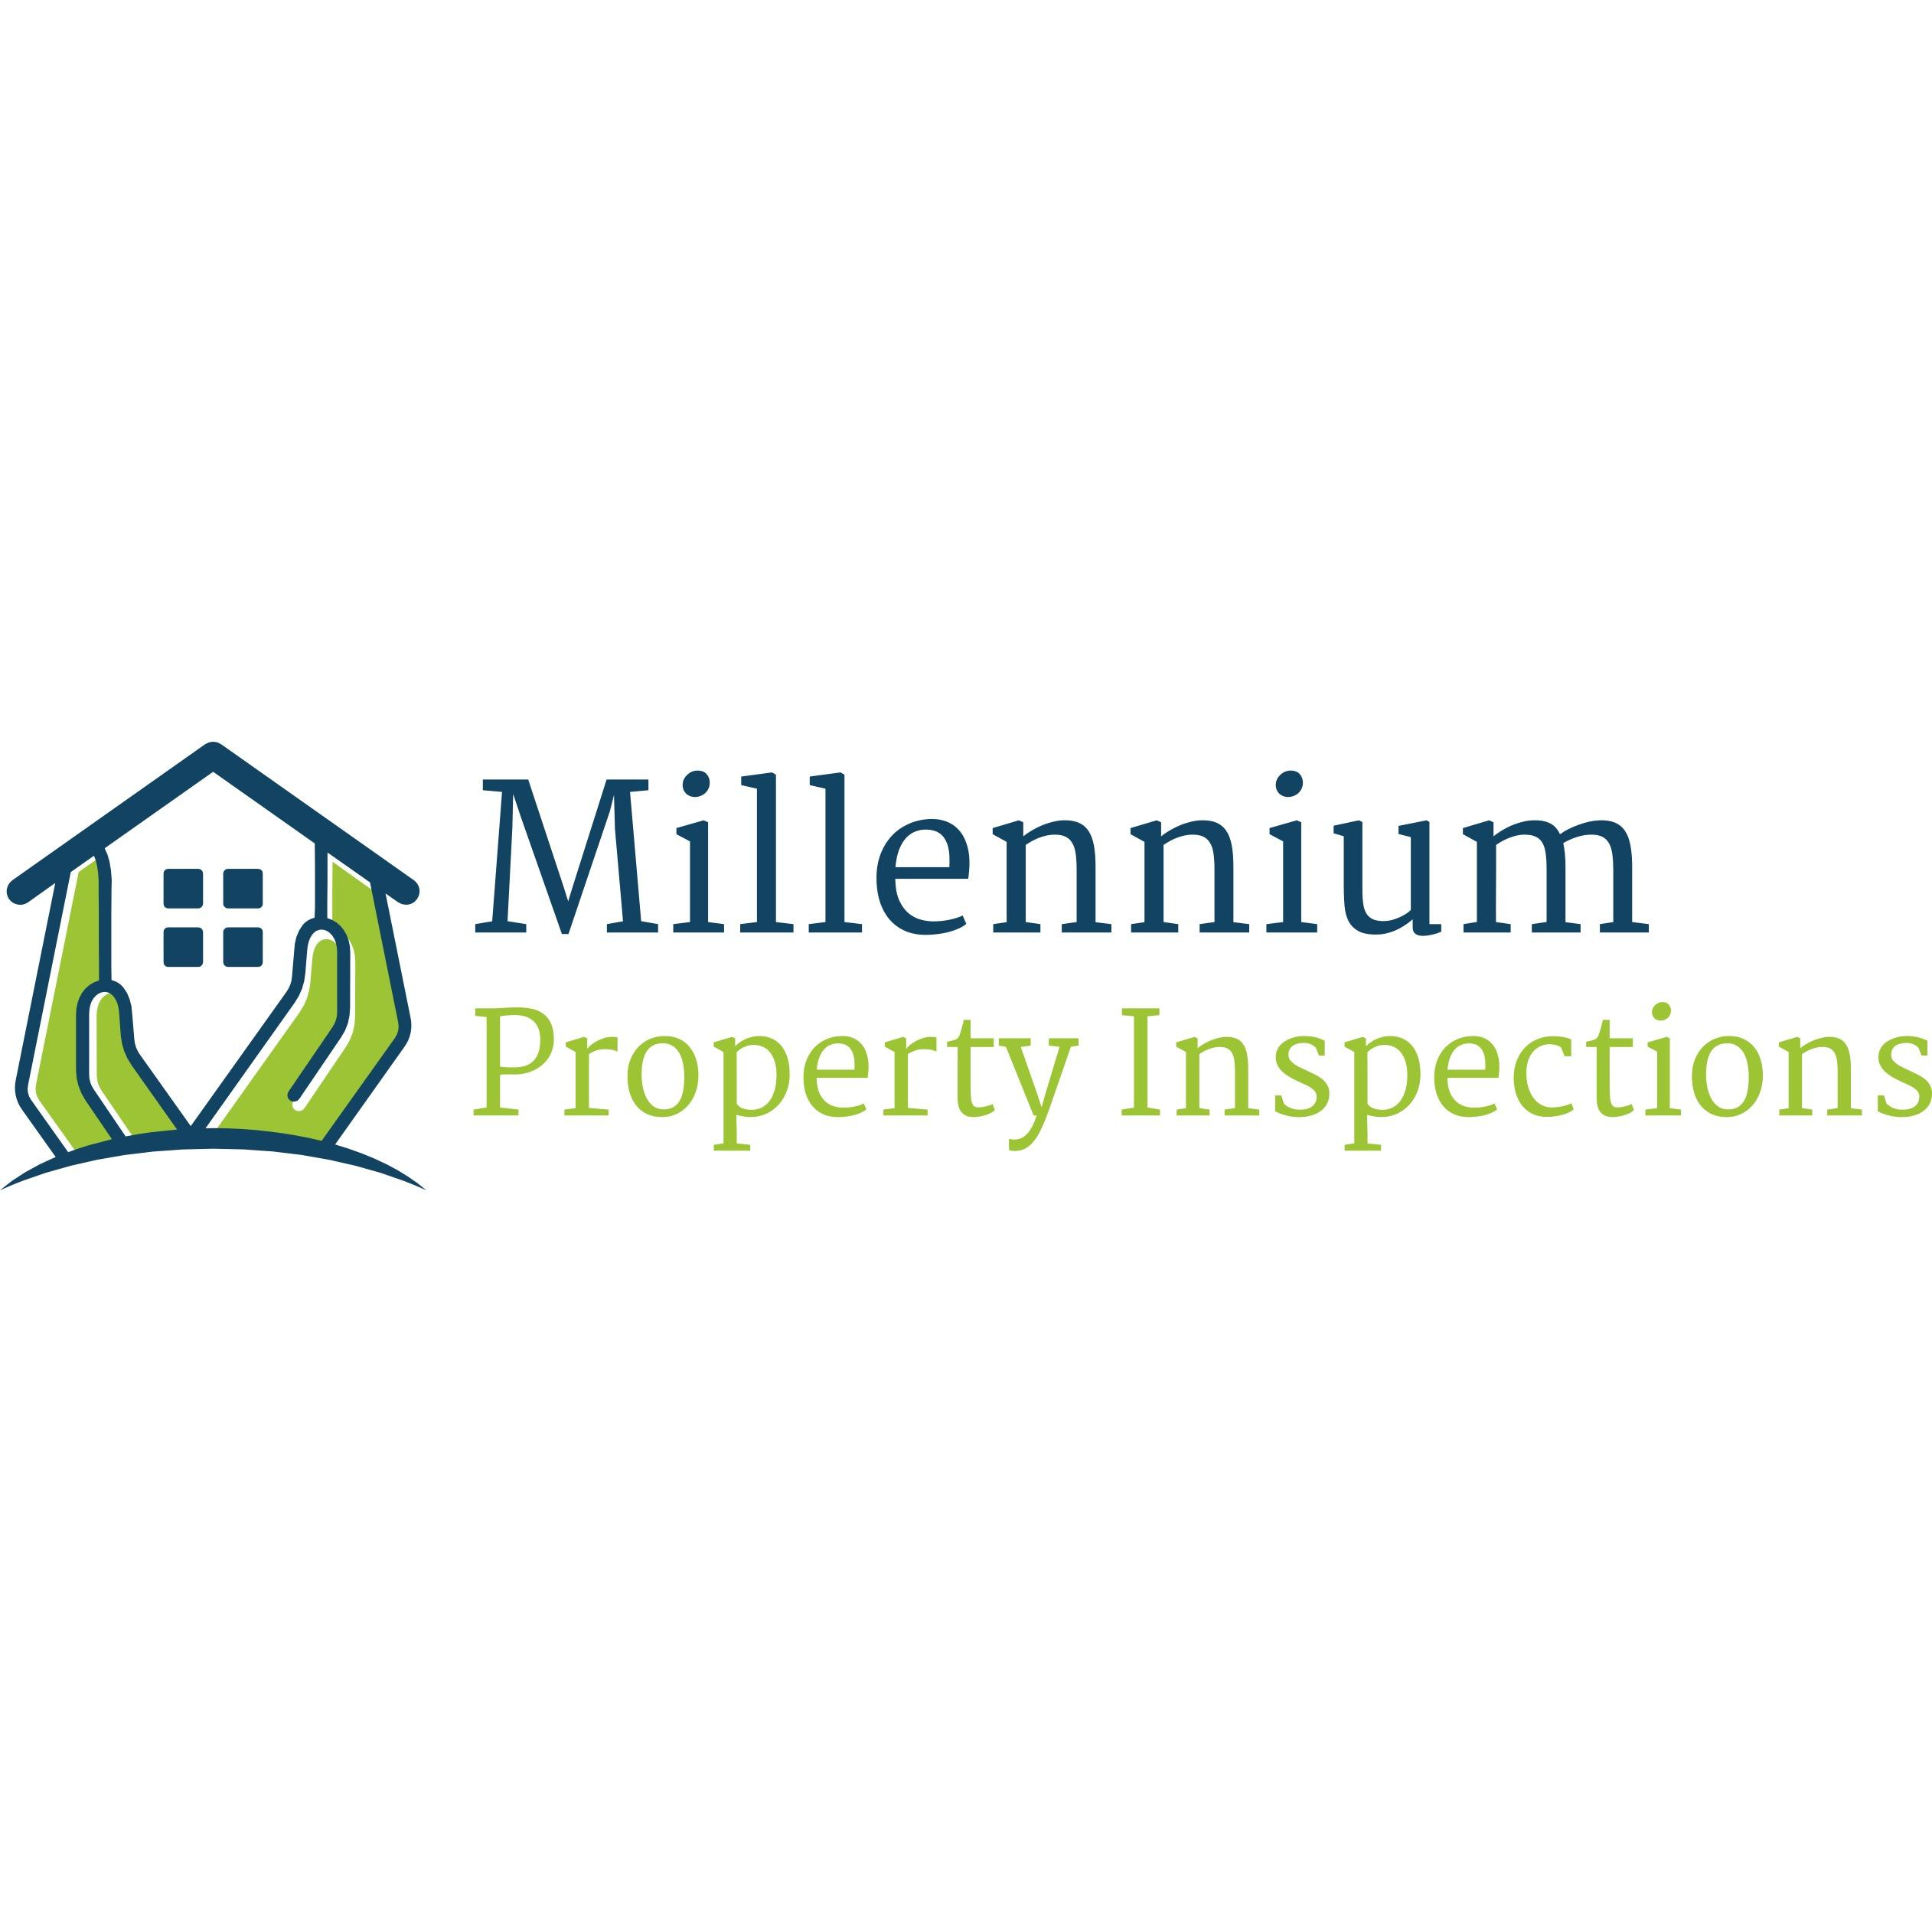 Millennium Property Inspections